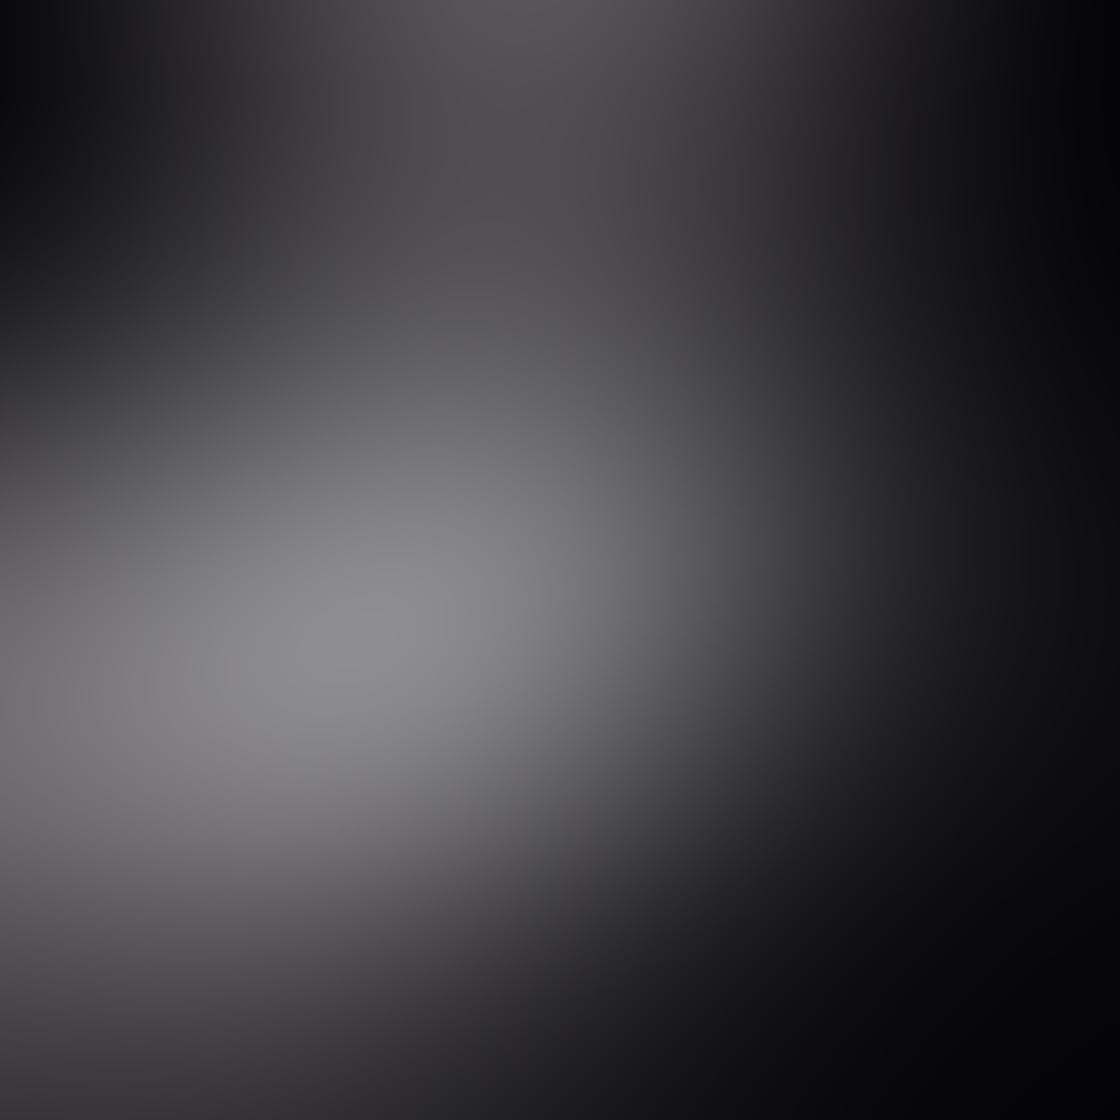 iPhone Photos Low Angle 19